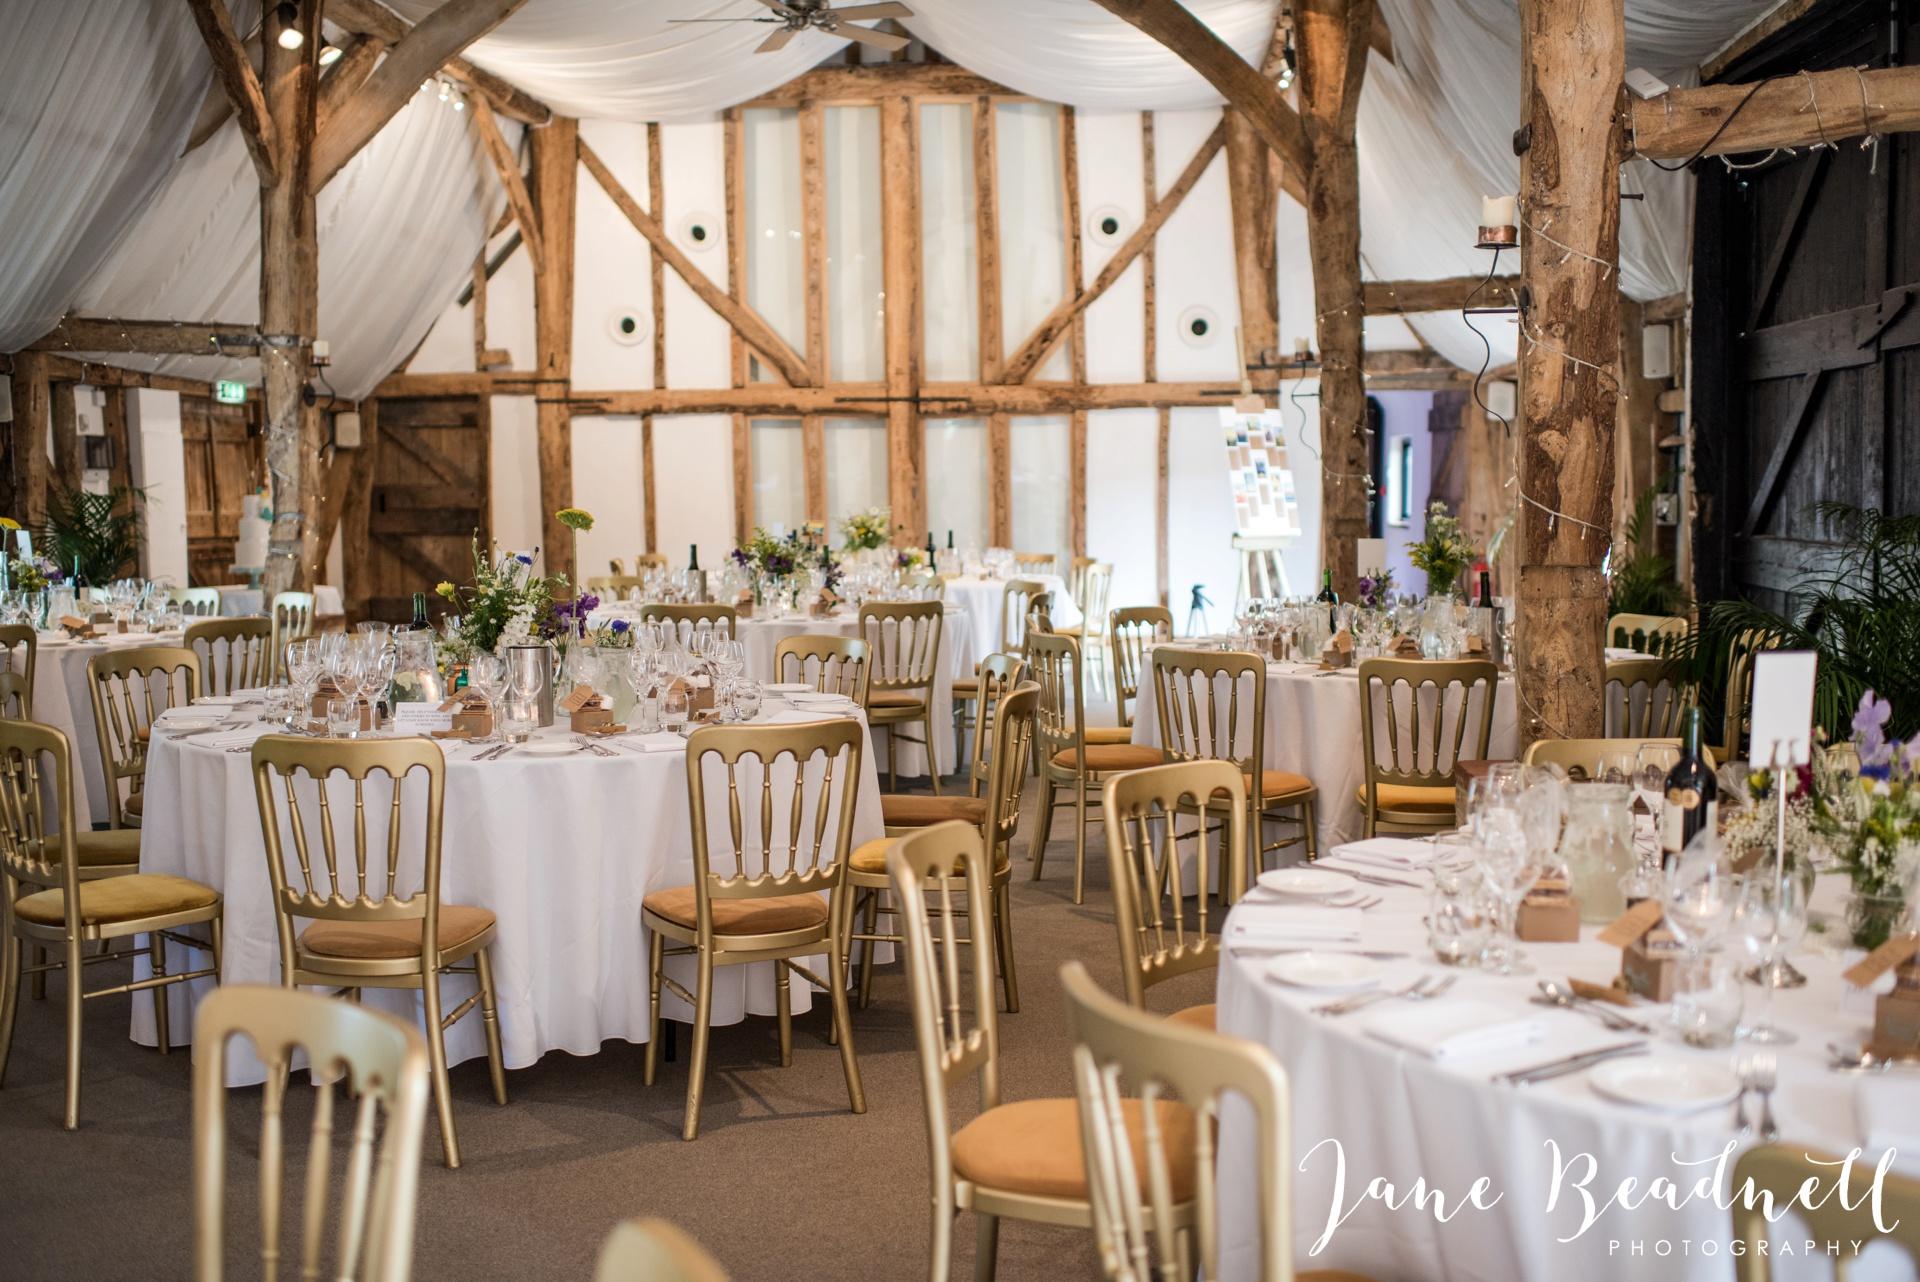 South Farm Wedding photography Hertfordshire by Jane Beadnell Photography fine art wedding photographer_0157